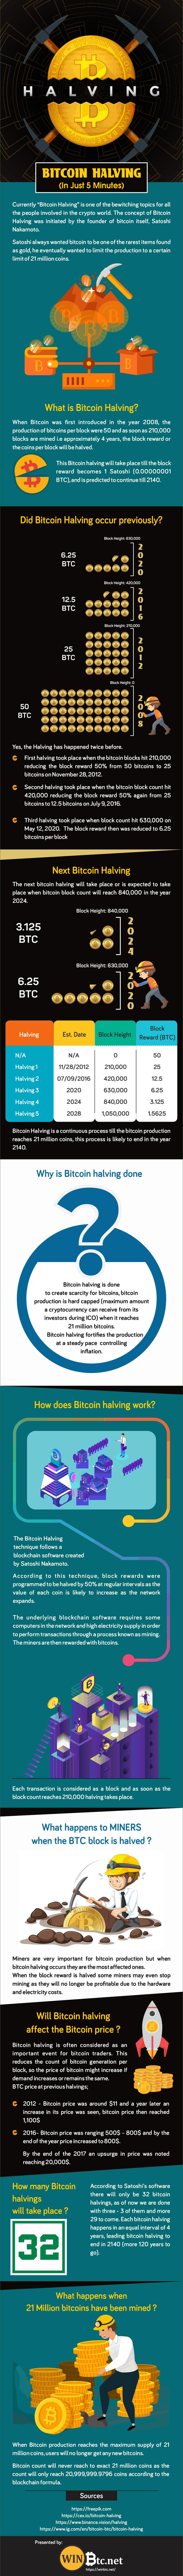 Bitcoin Halving - Infographic